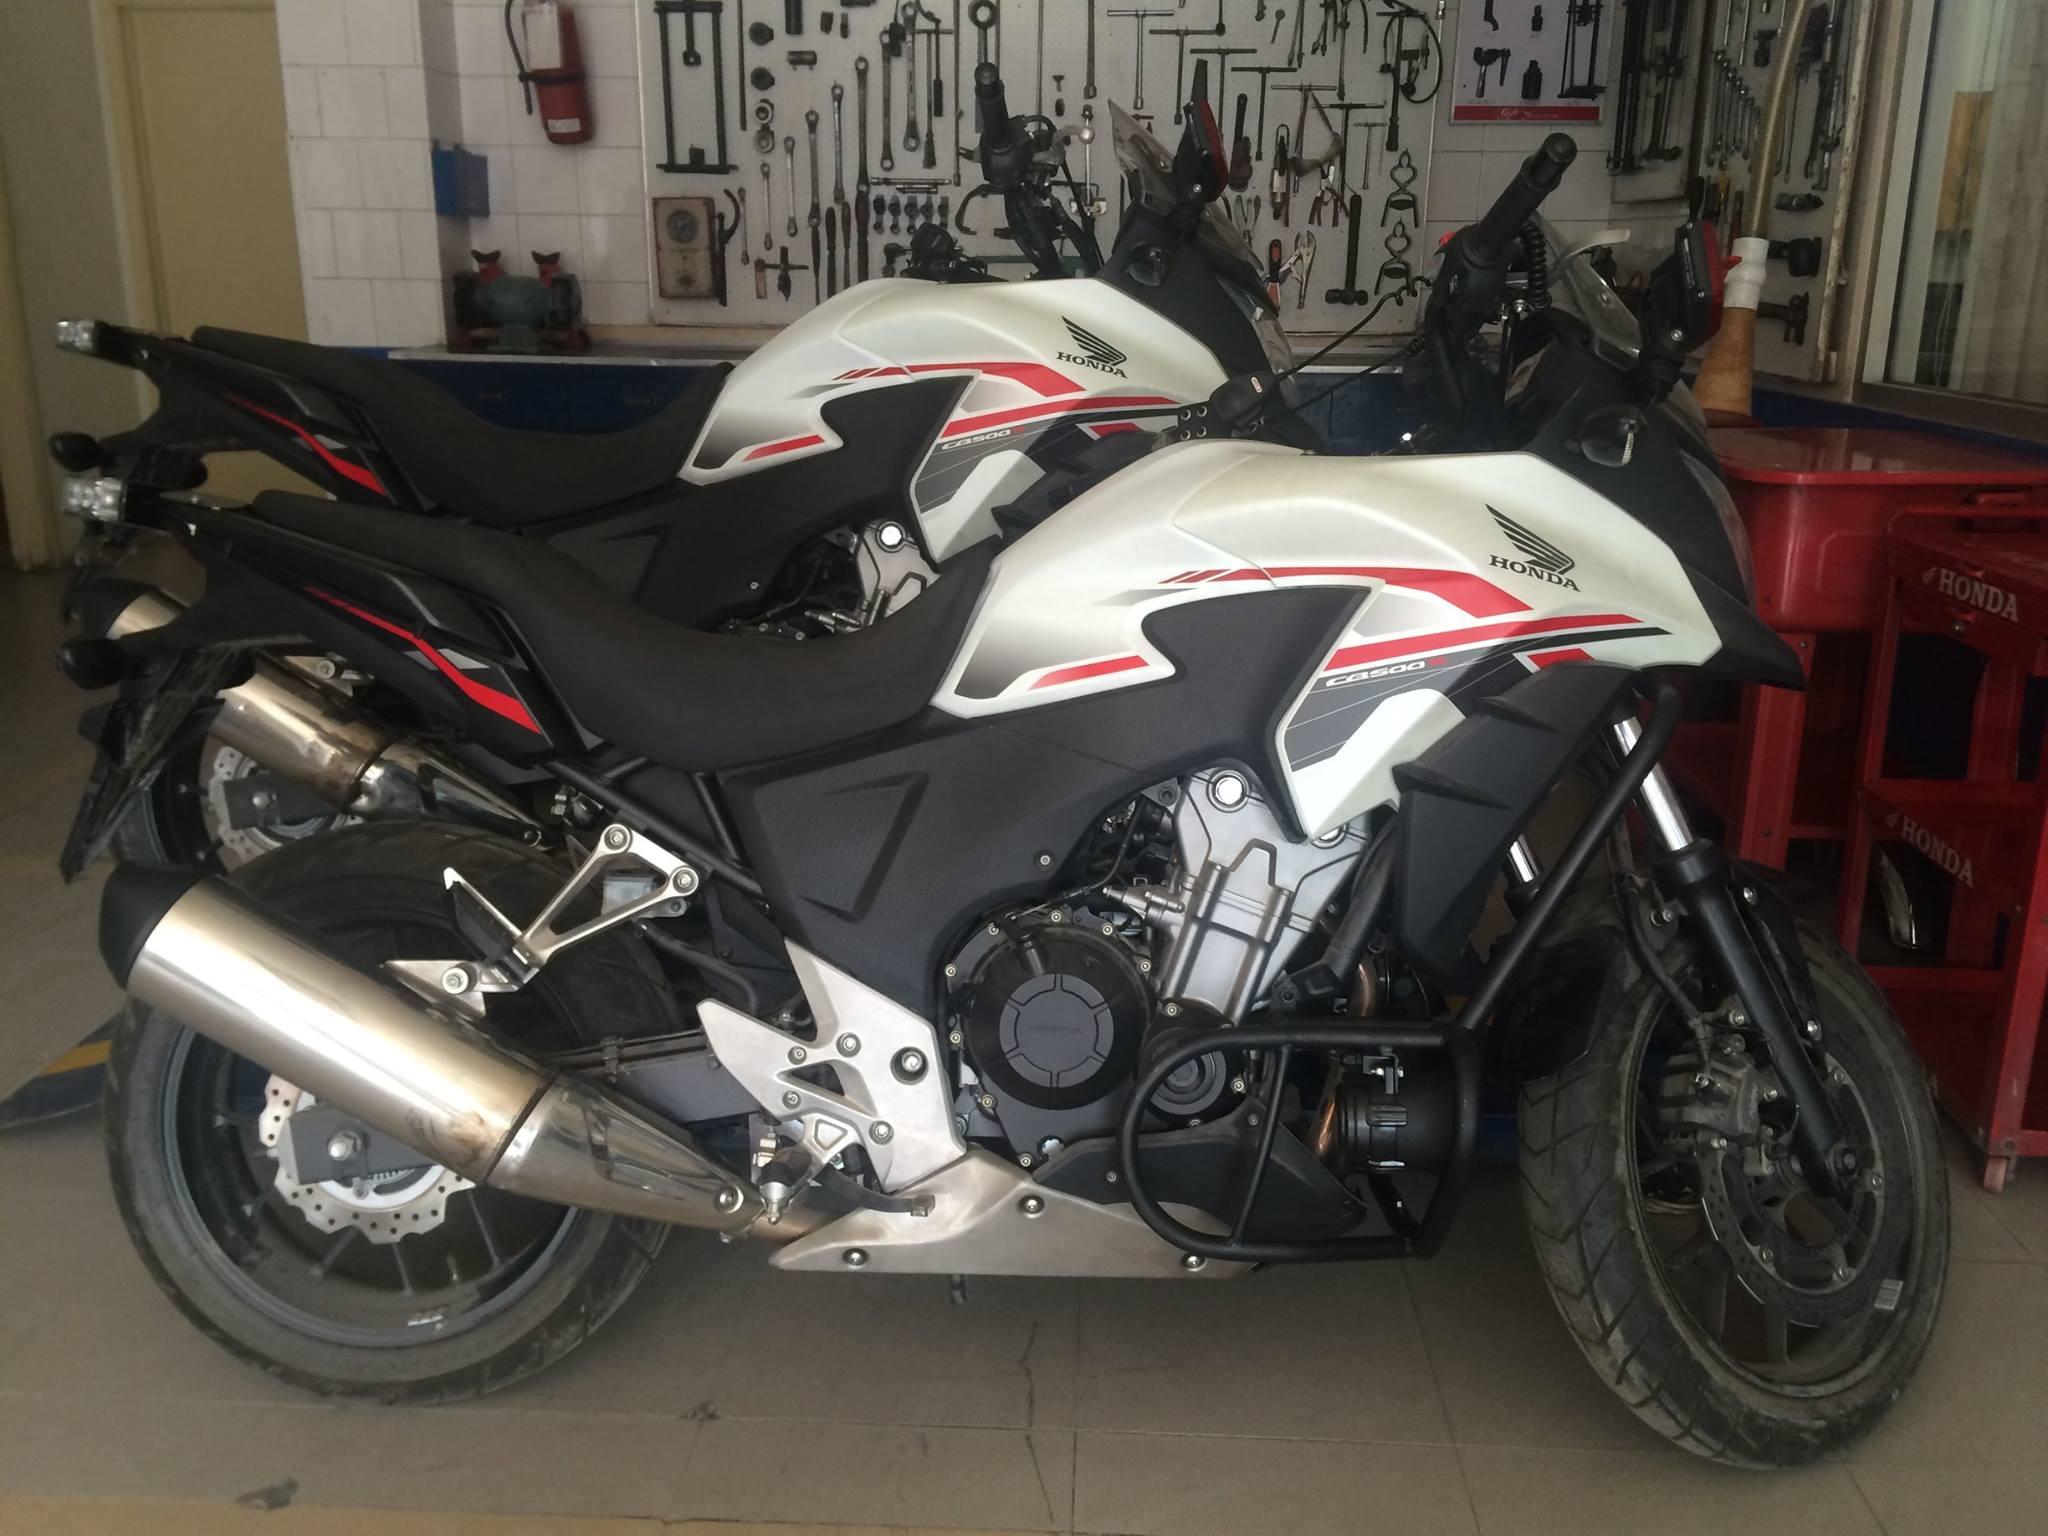 dolphin squad honda cb500x motorcycle (1)